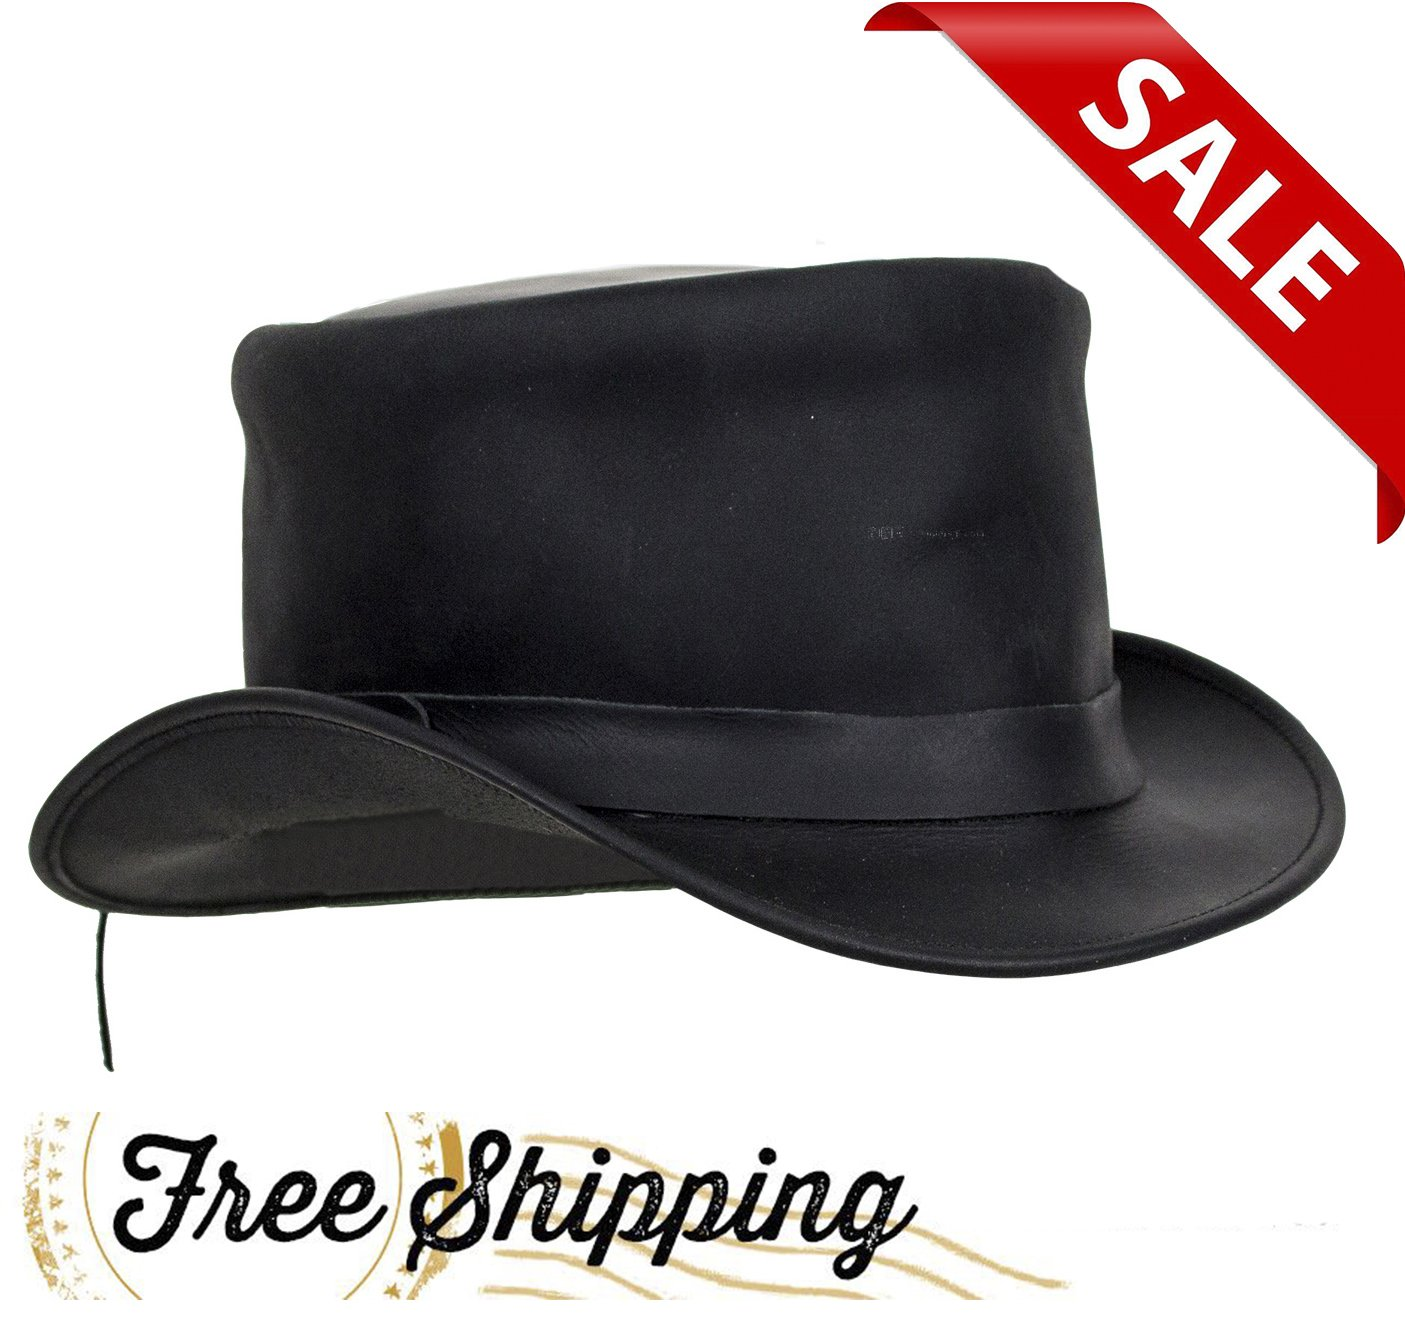 DREAM APPAREL Black Leather Deadman Top Hat (XL)